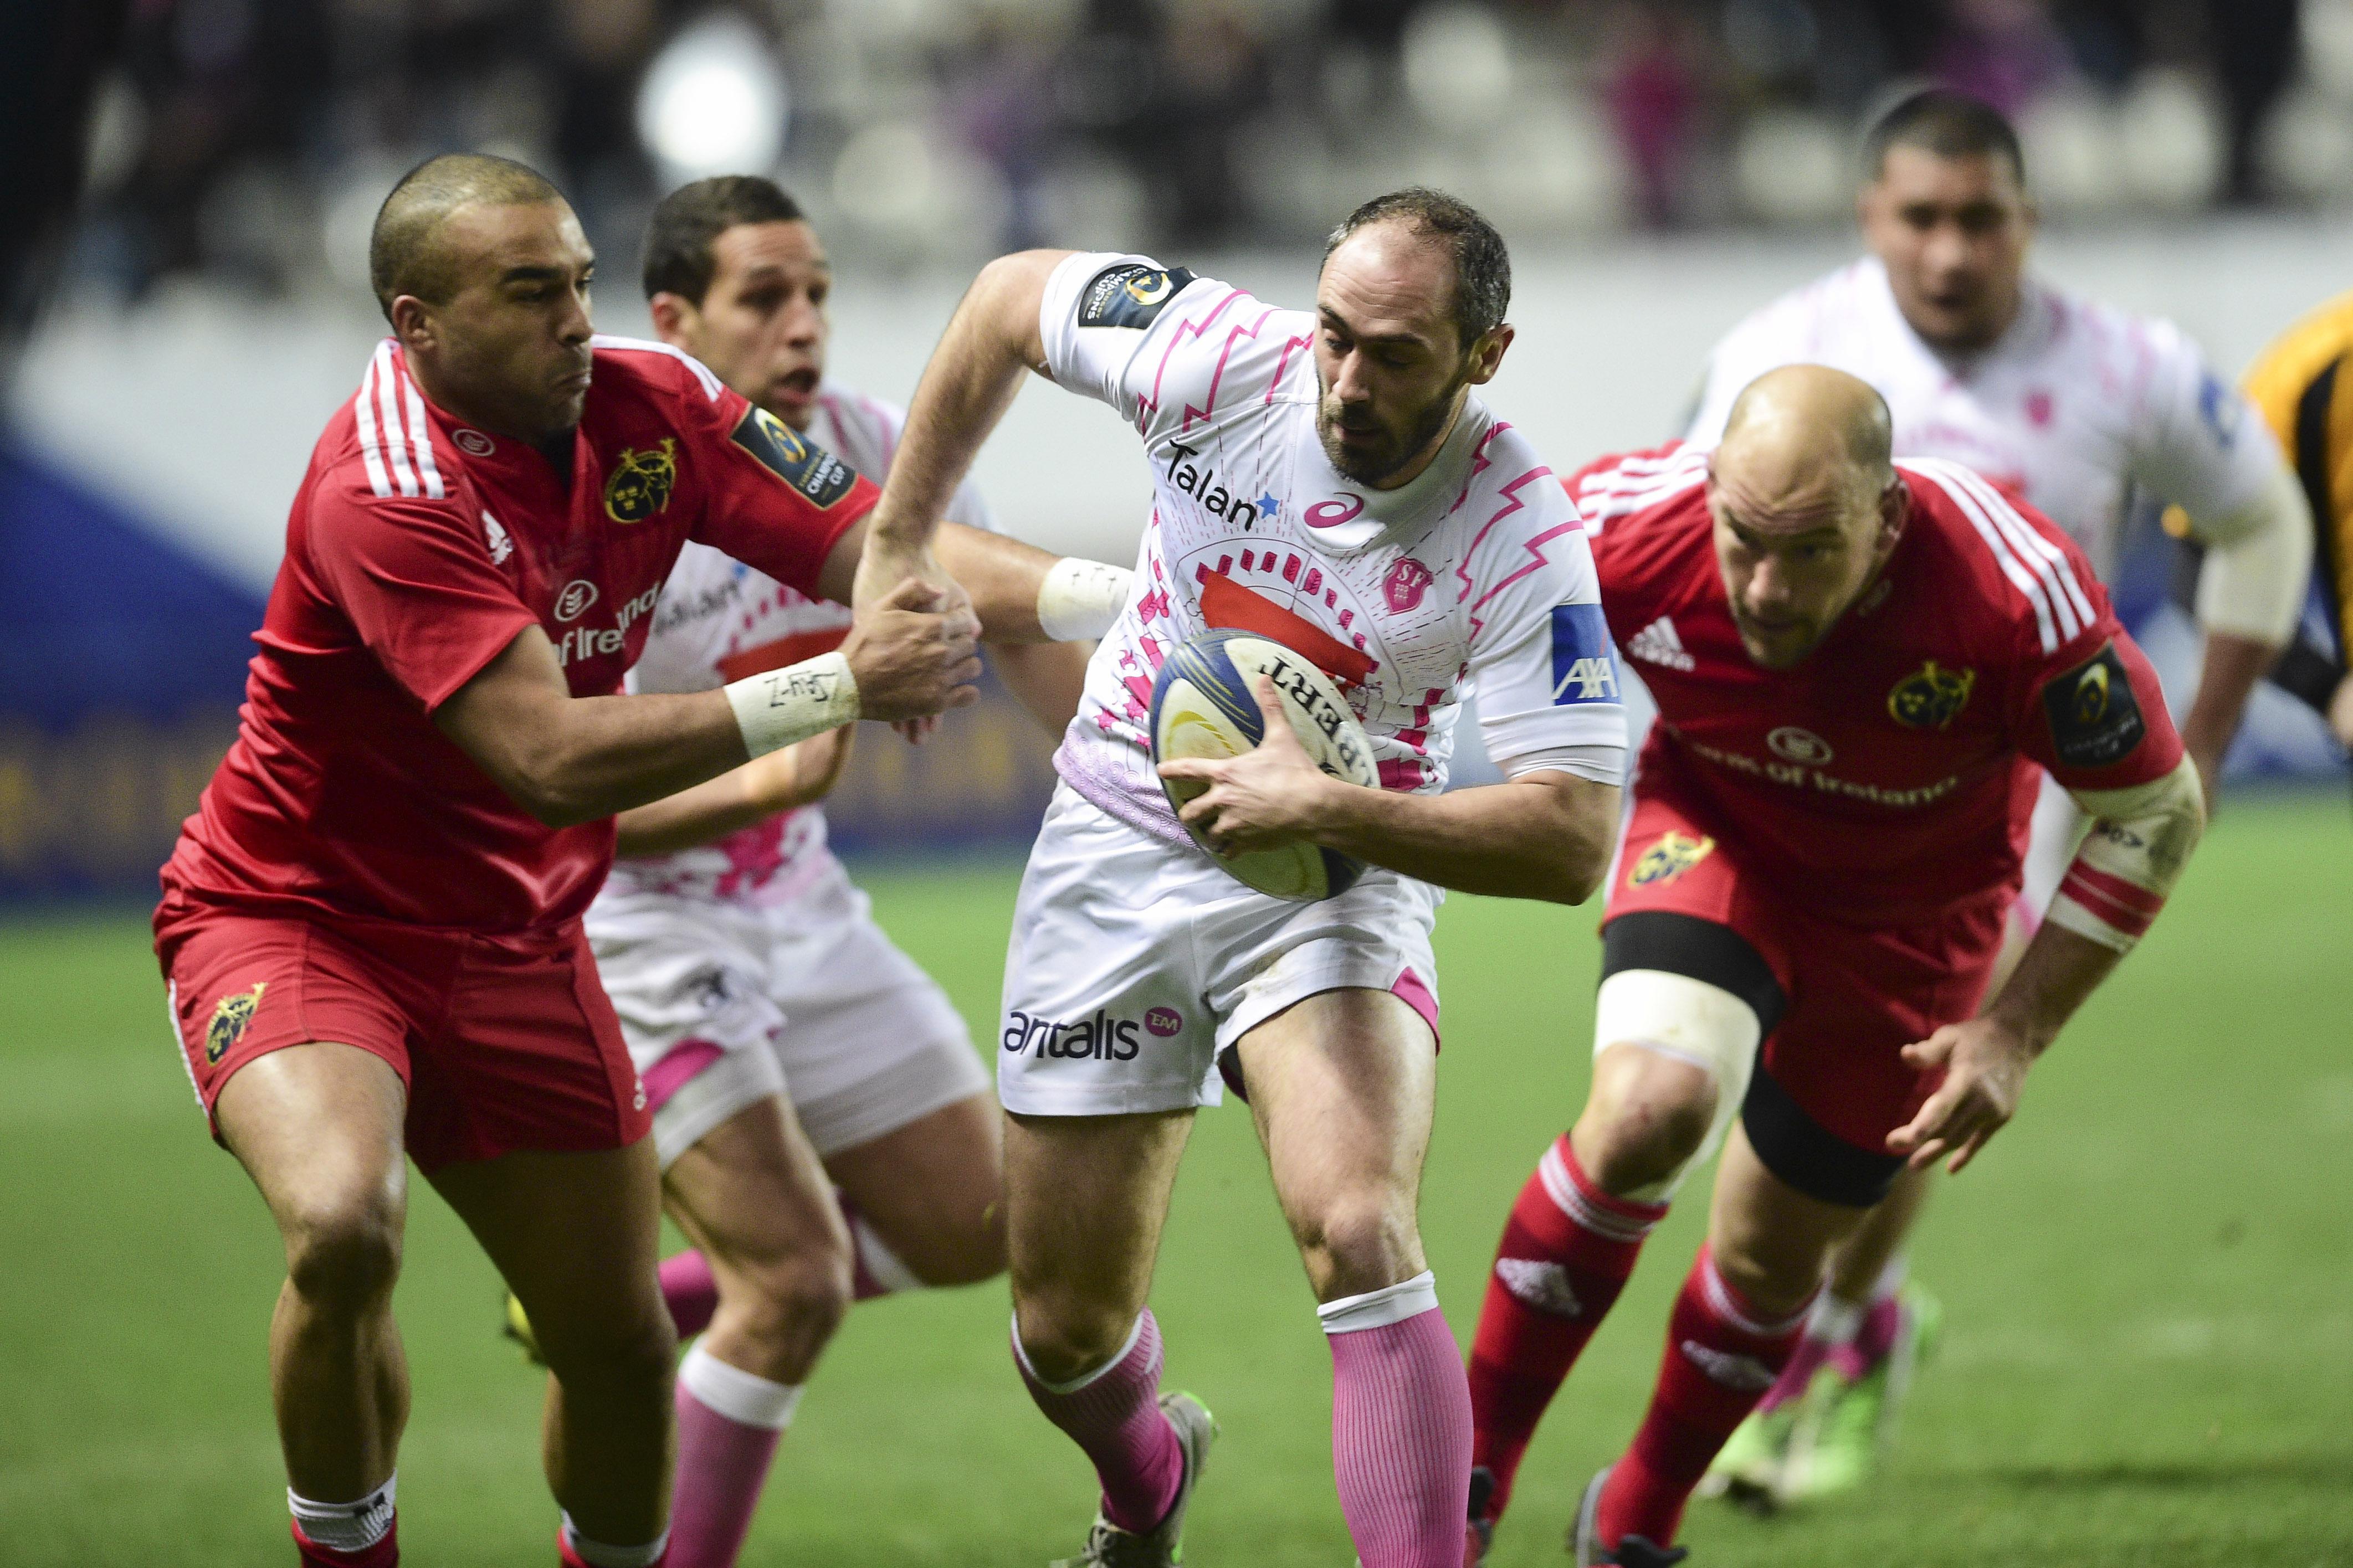 Rugby - Coupes d'Europe - Stade Français : une embellie à confirmer